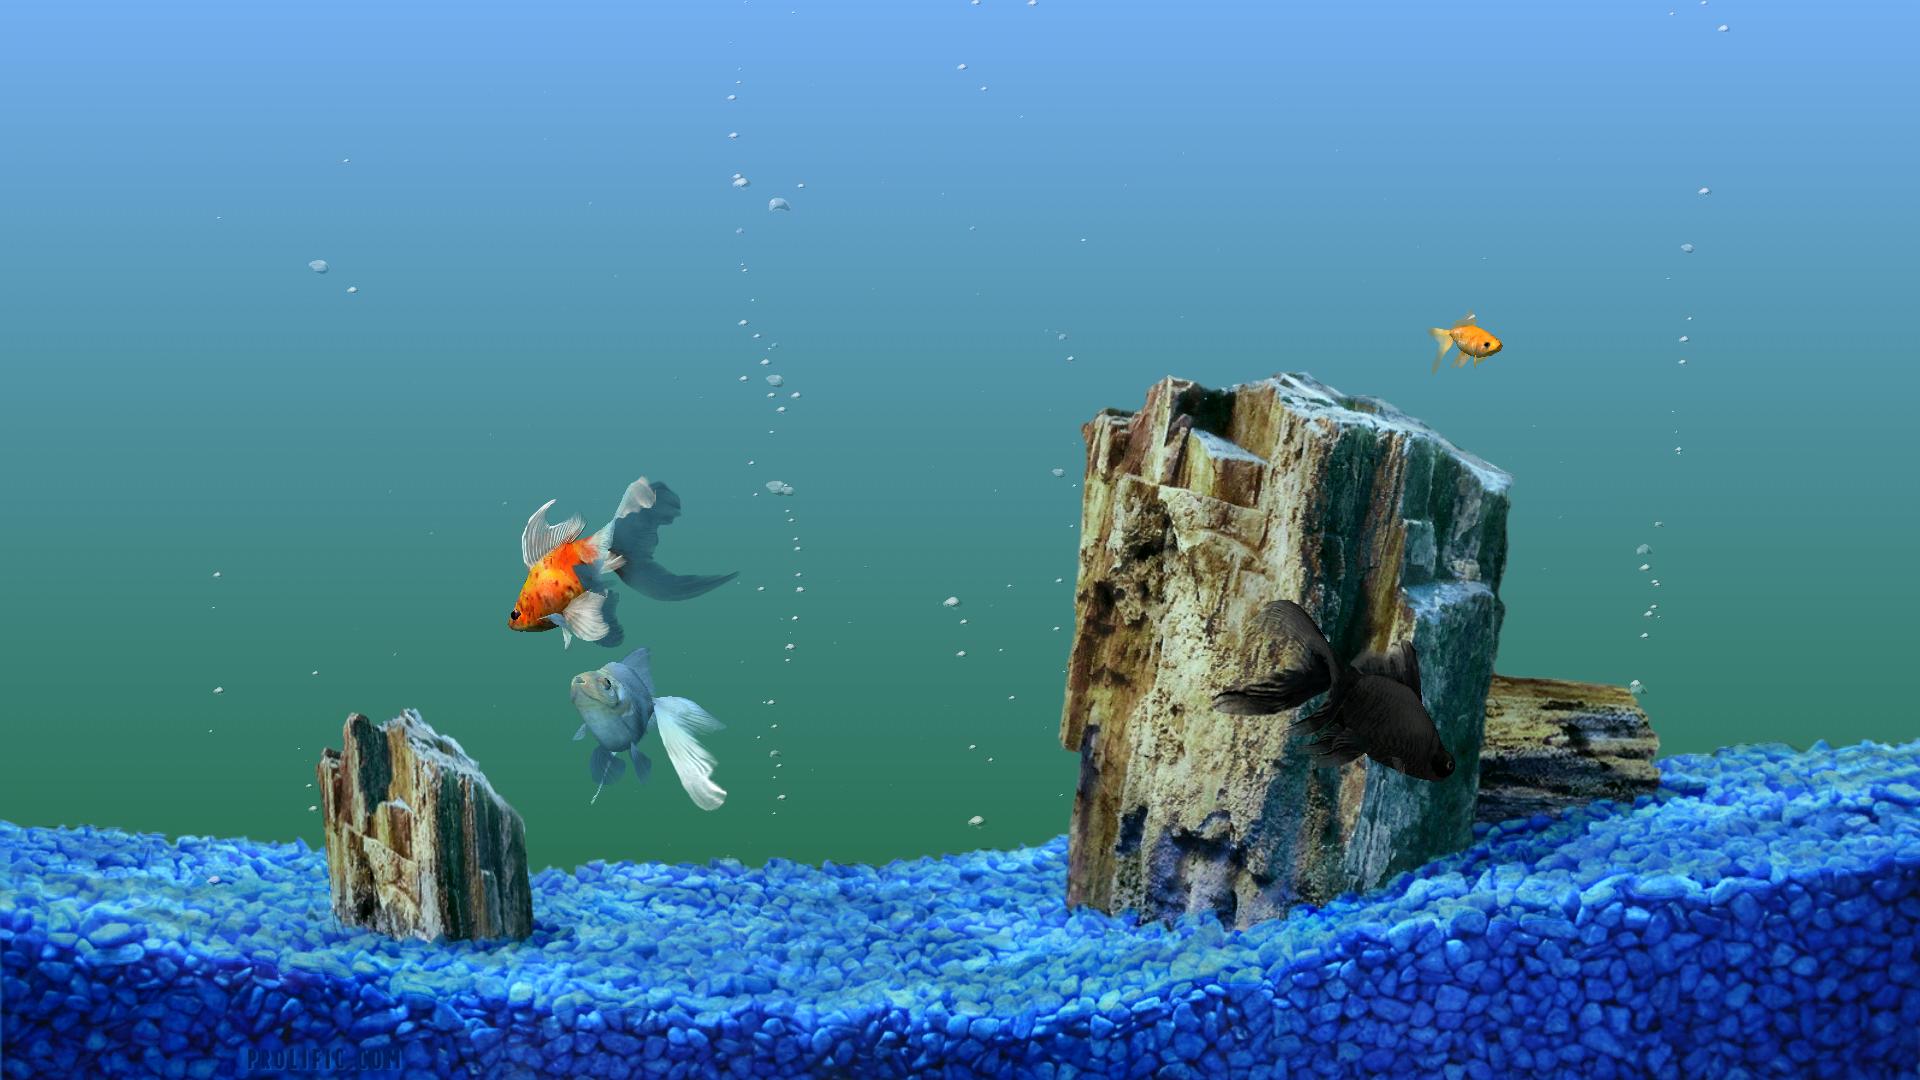 Fish aquarium screensaver for xp - Sim Aquarium Screensaver 2 07